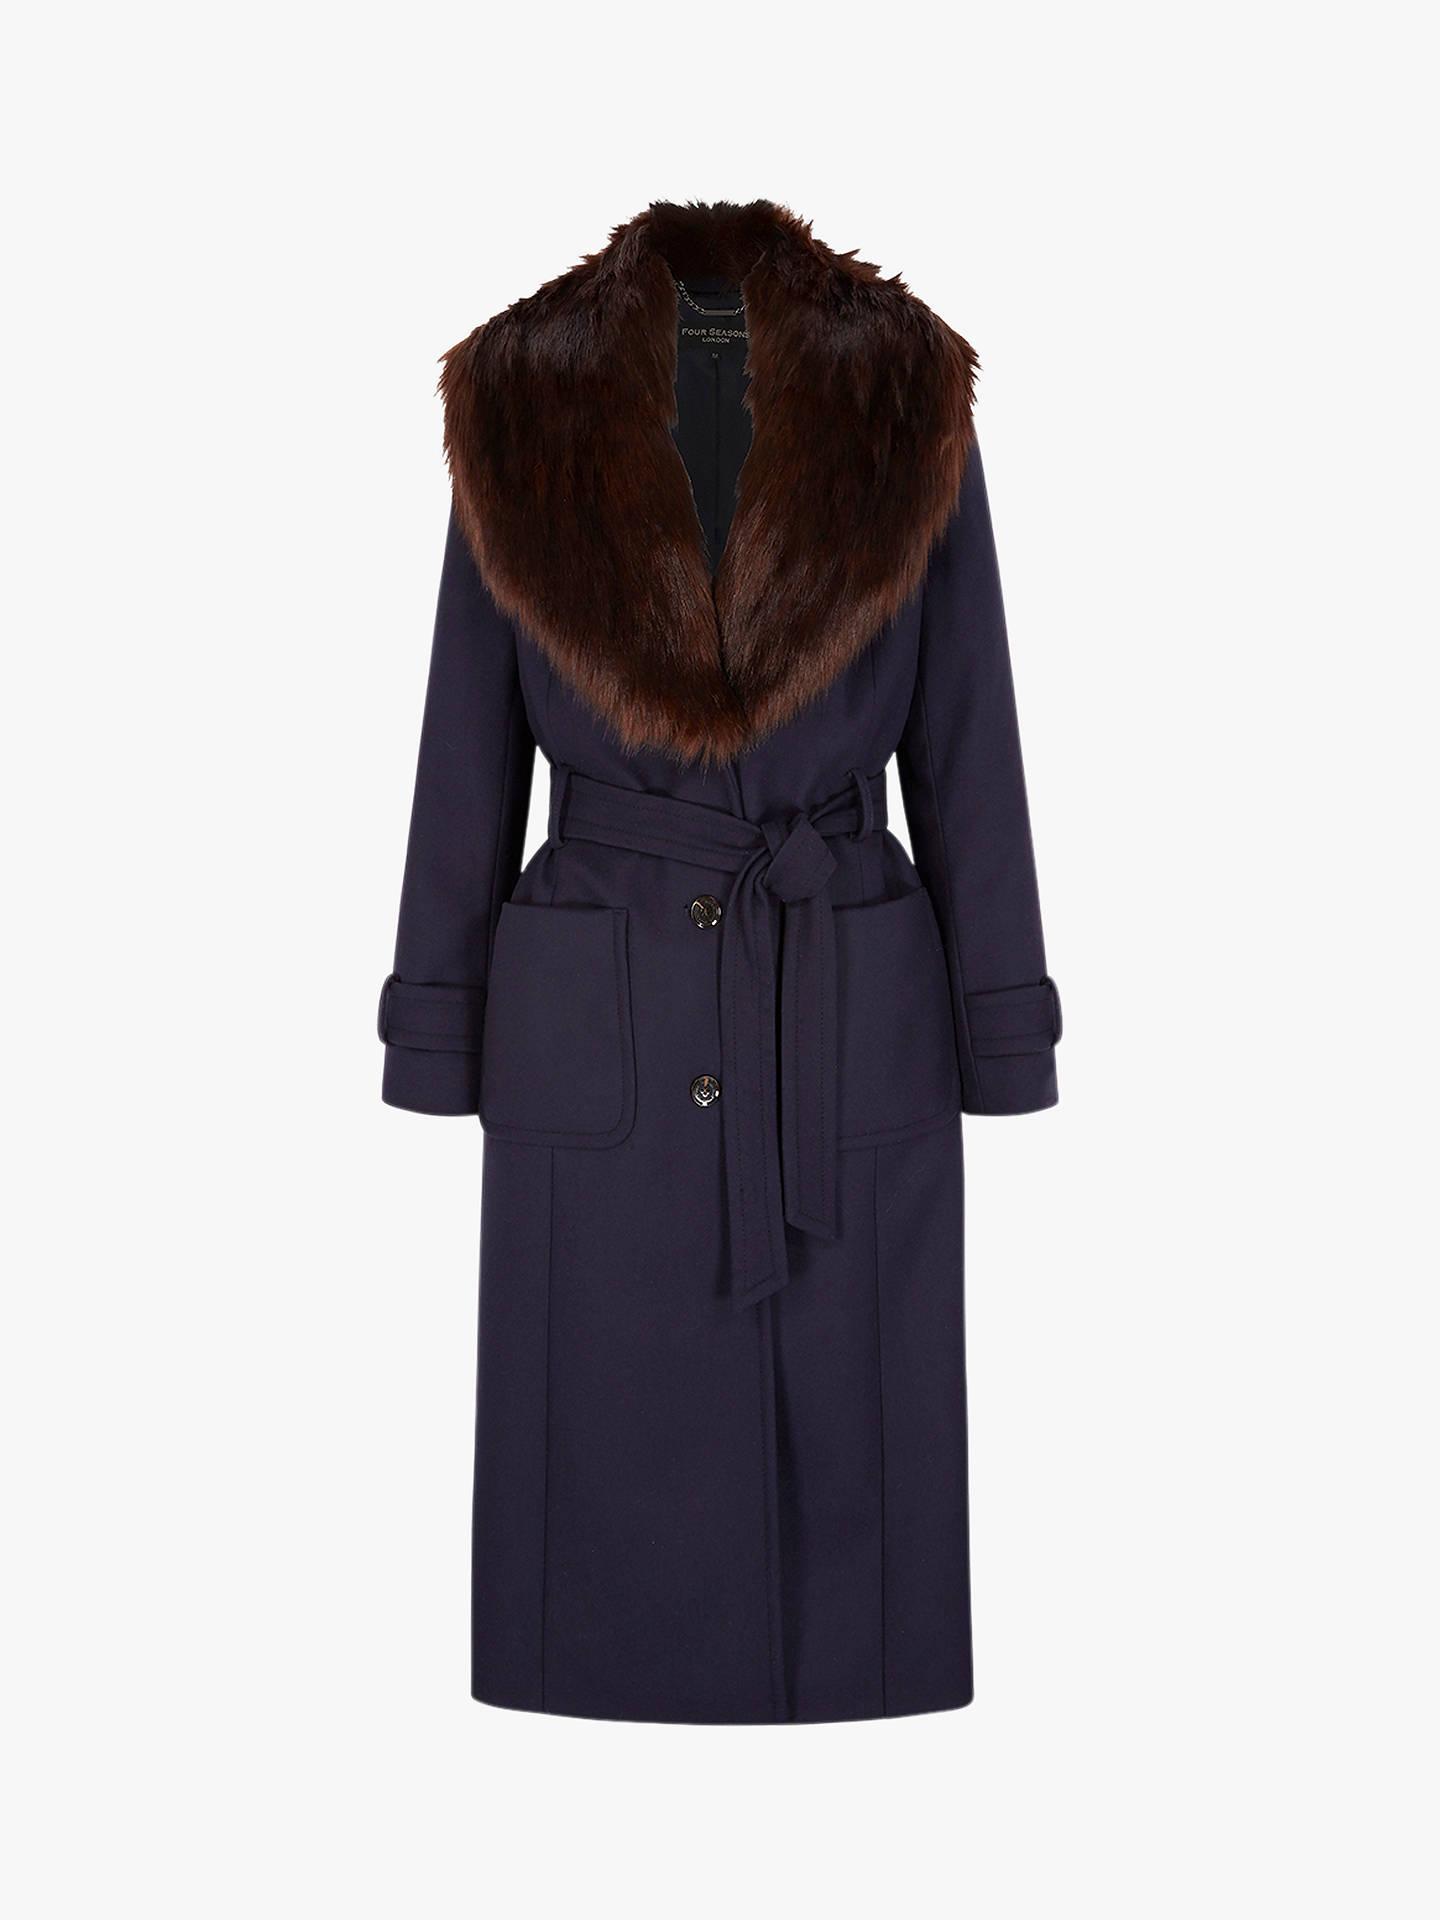 3a55a9ae6358 Buy Four Seasons Faux Fur Collar Coat